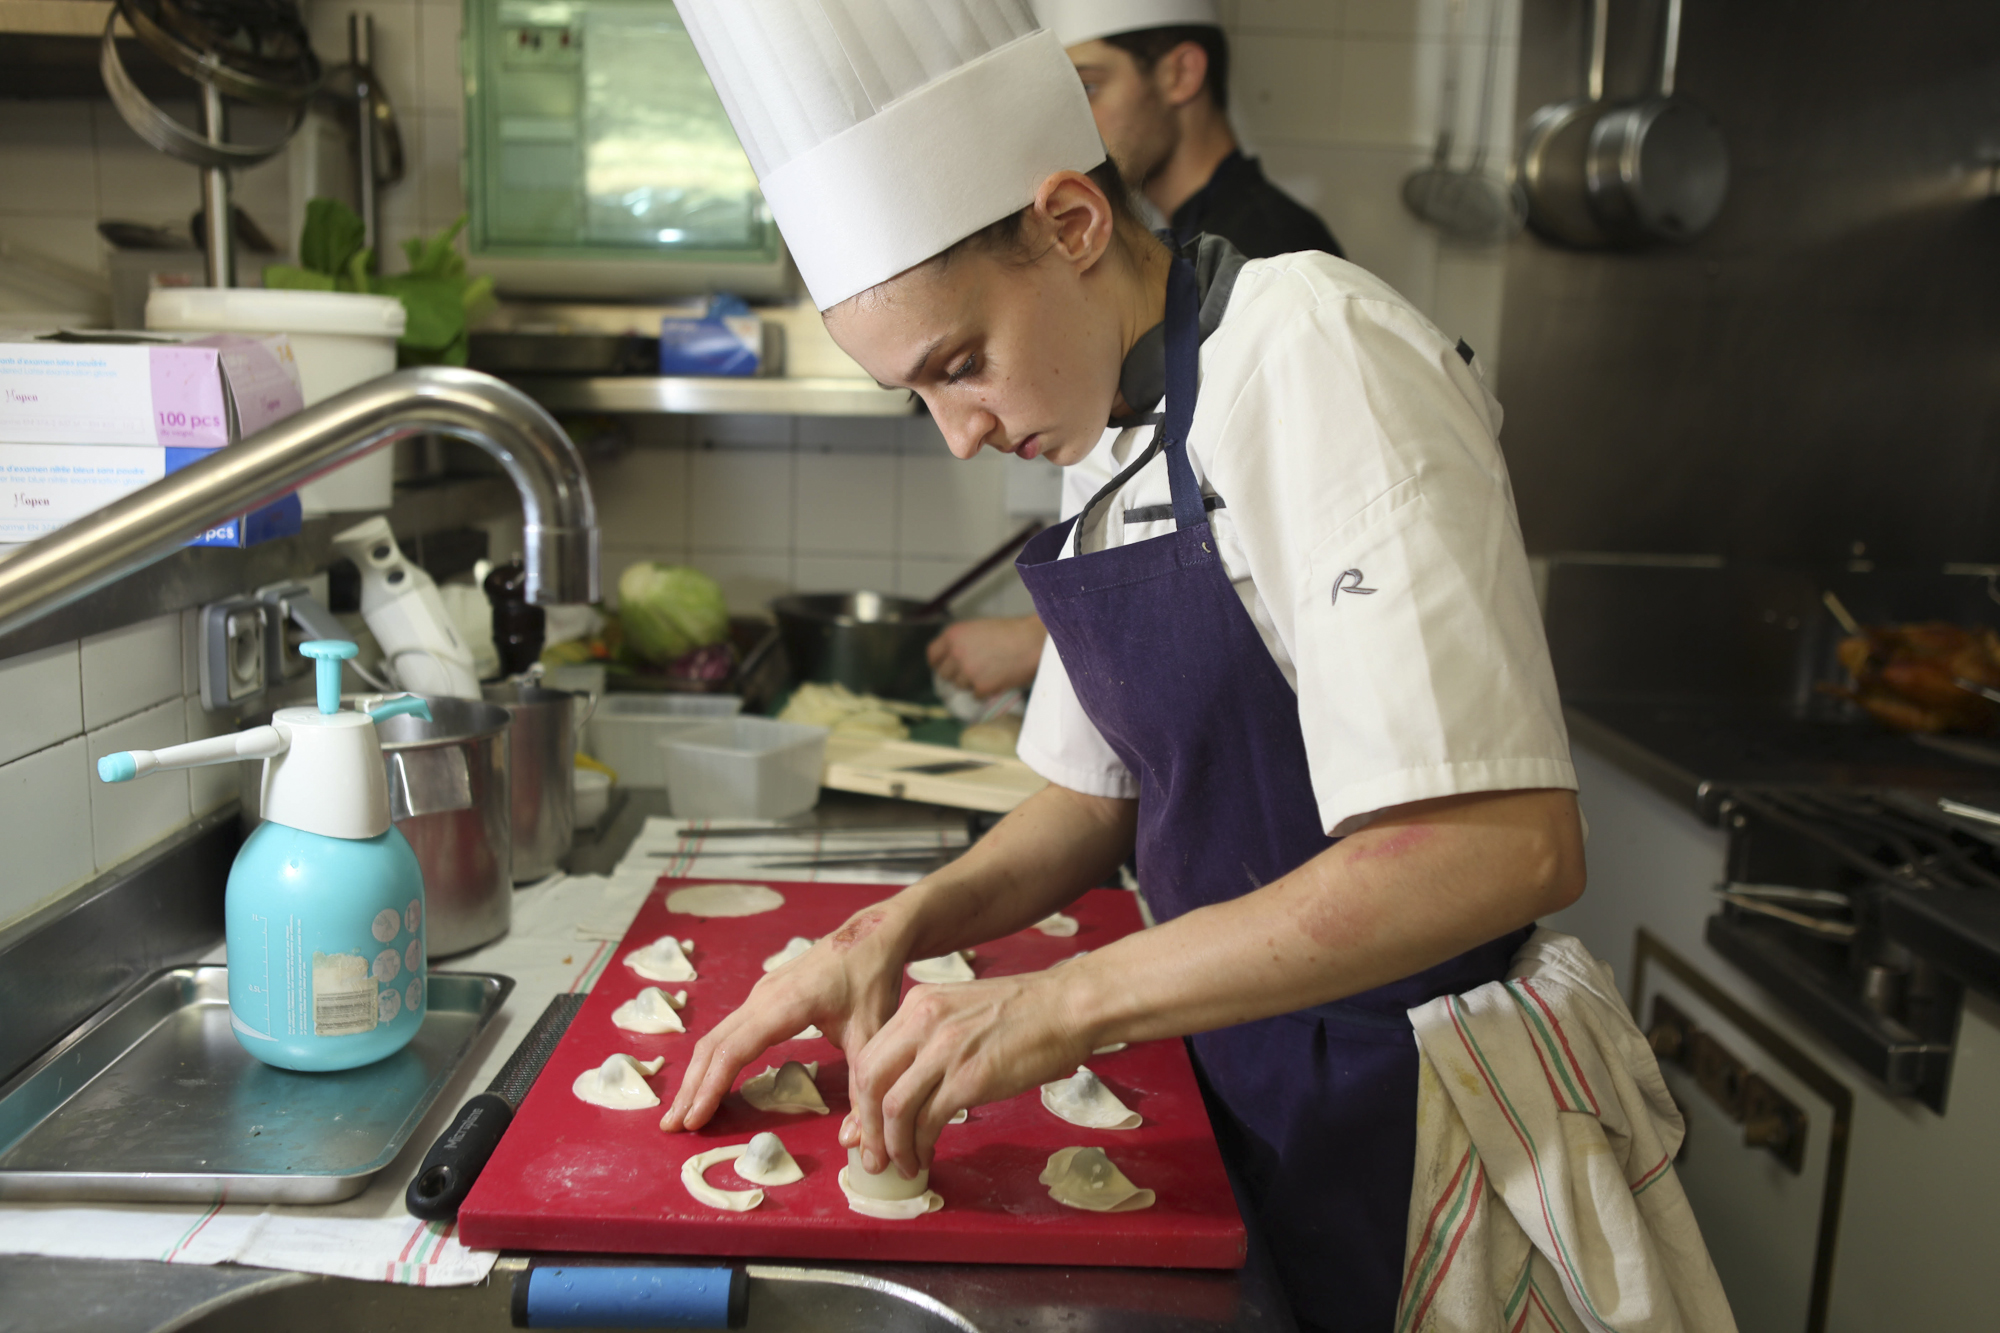 L'Arpege, three Michelin stars restaurant in Paris. Kale ravioli (preparation)